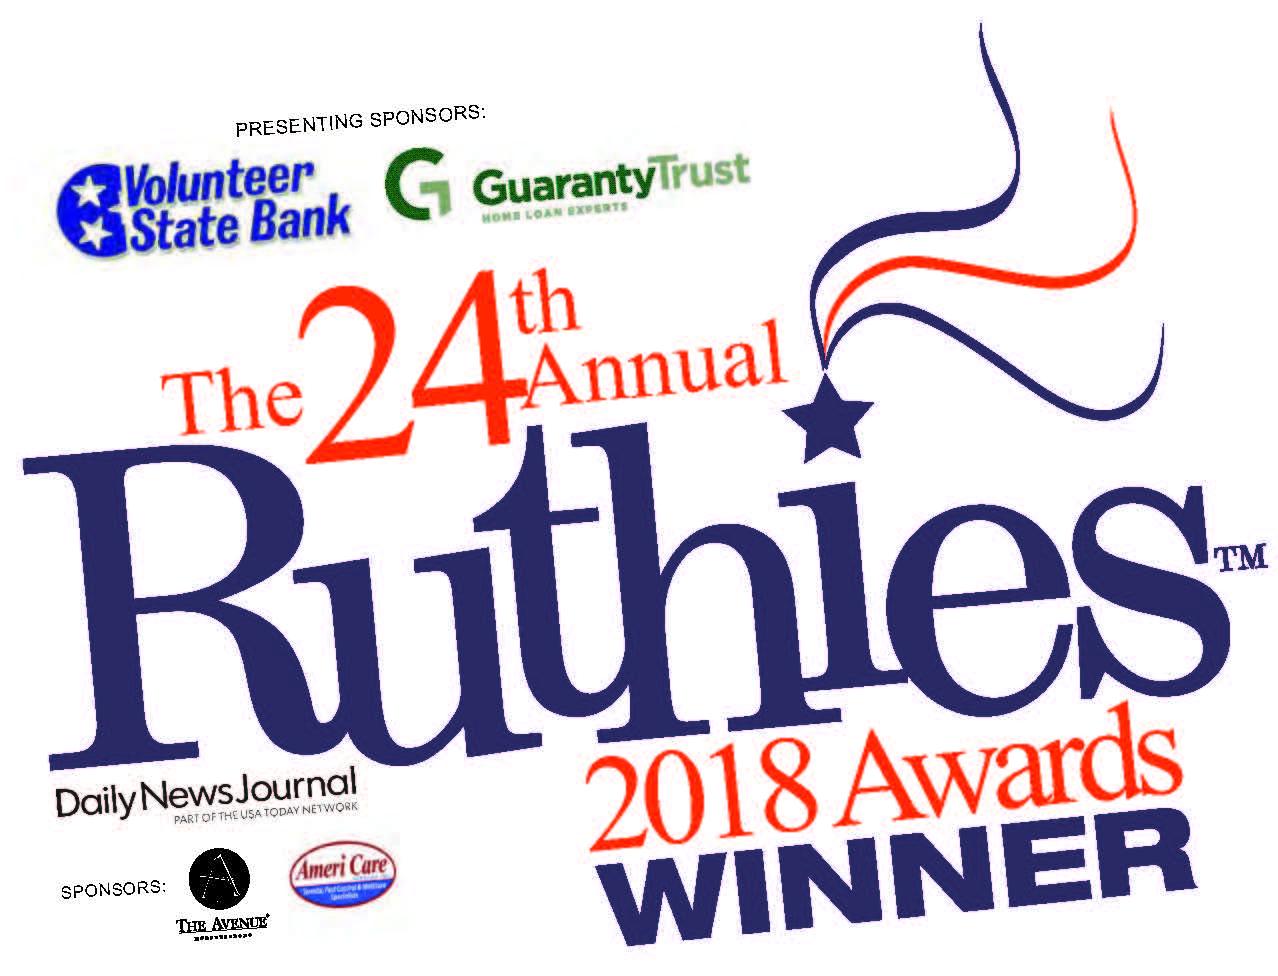 Winner_RuthiesLogo_wSponsors_2018